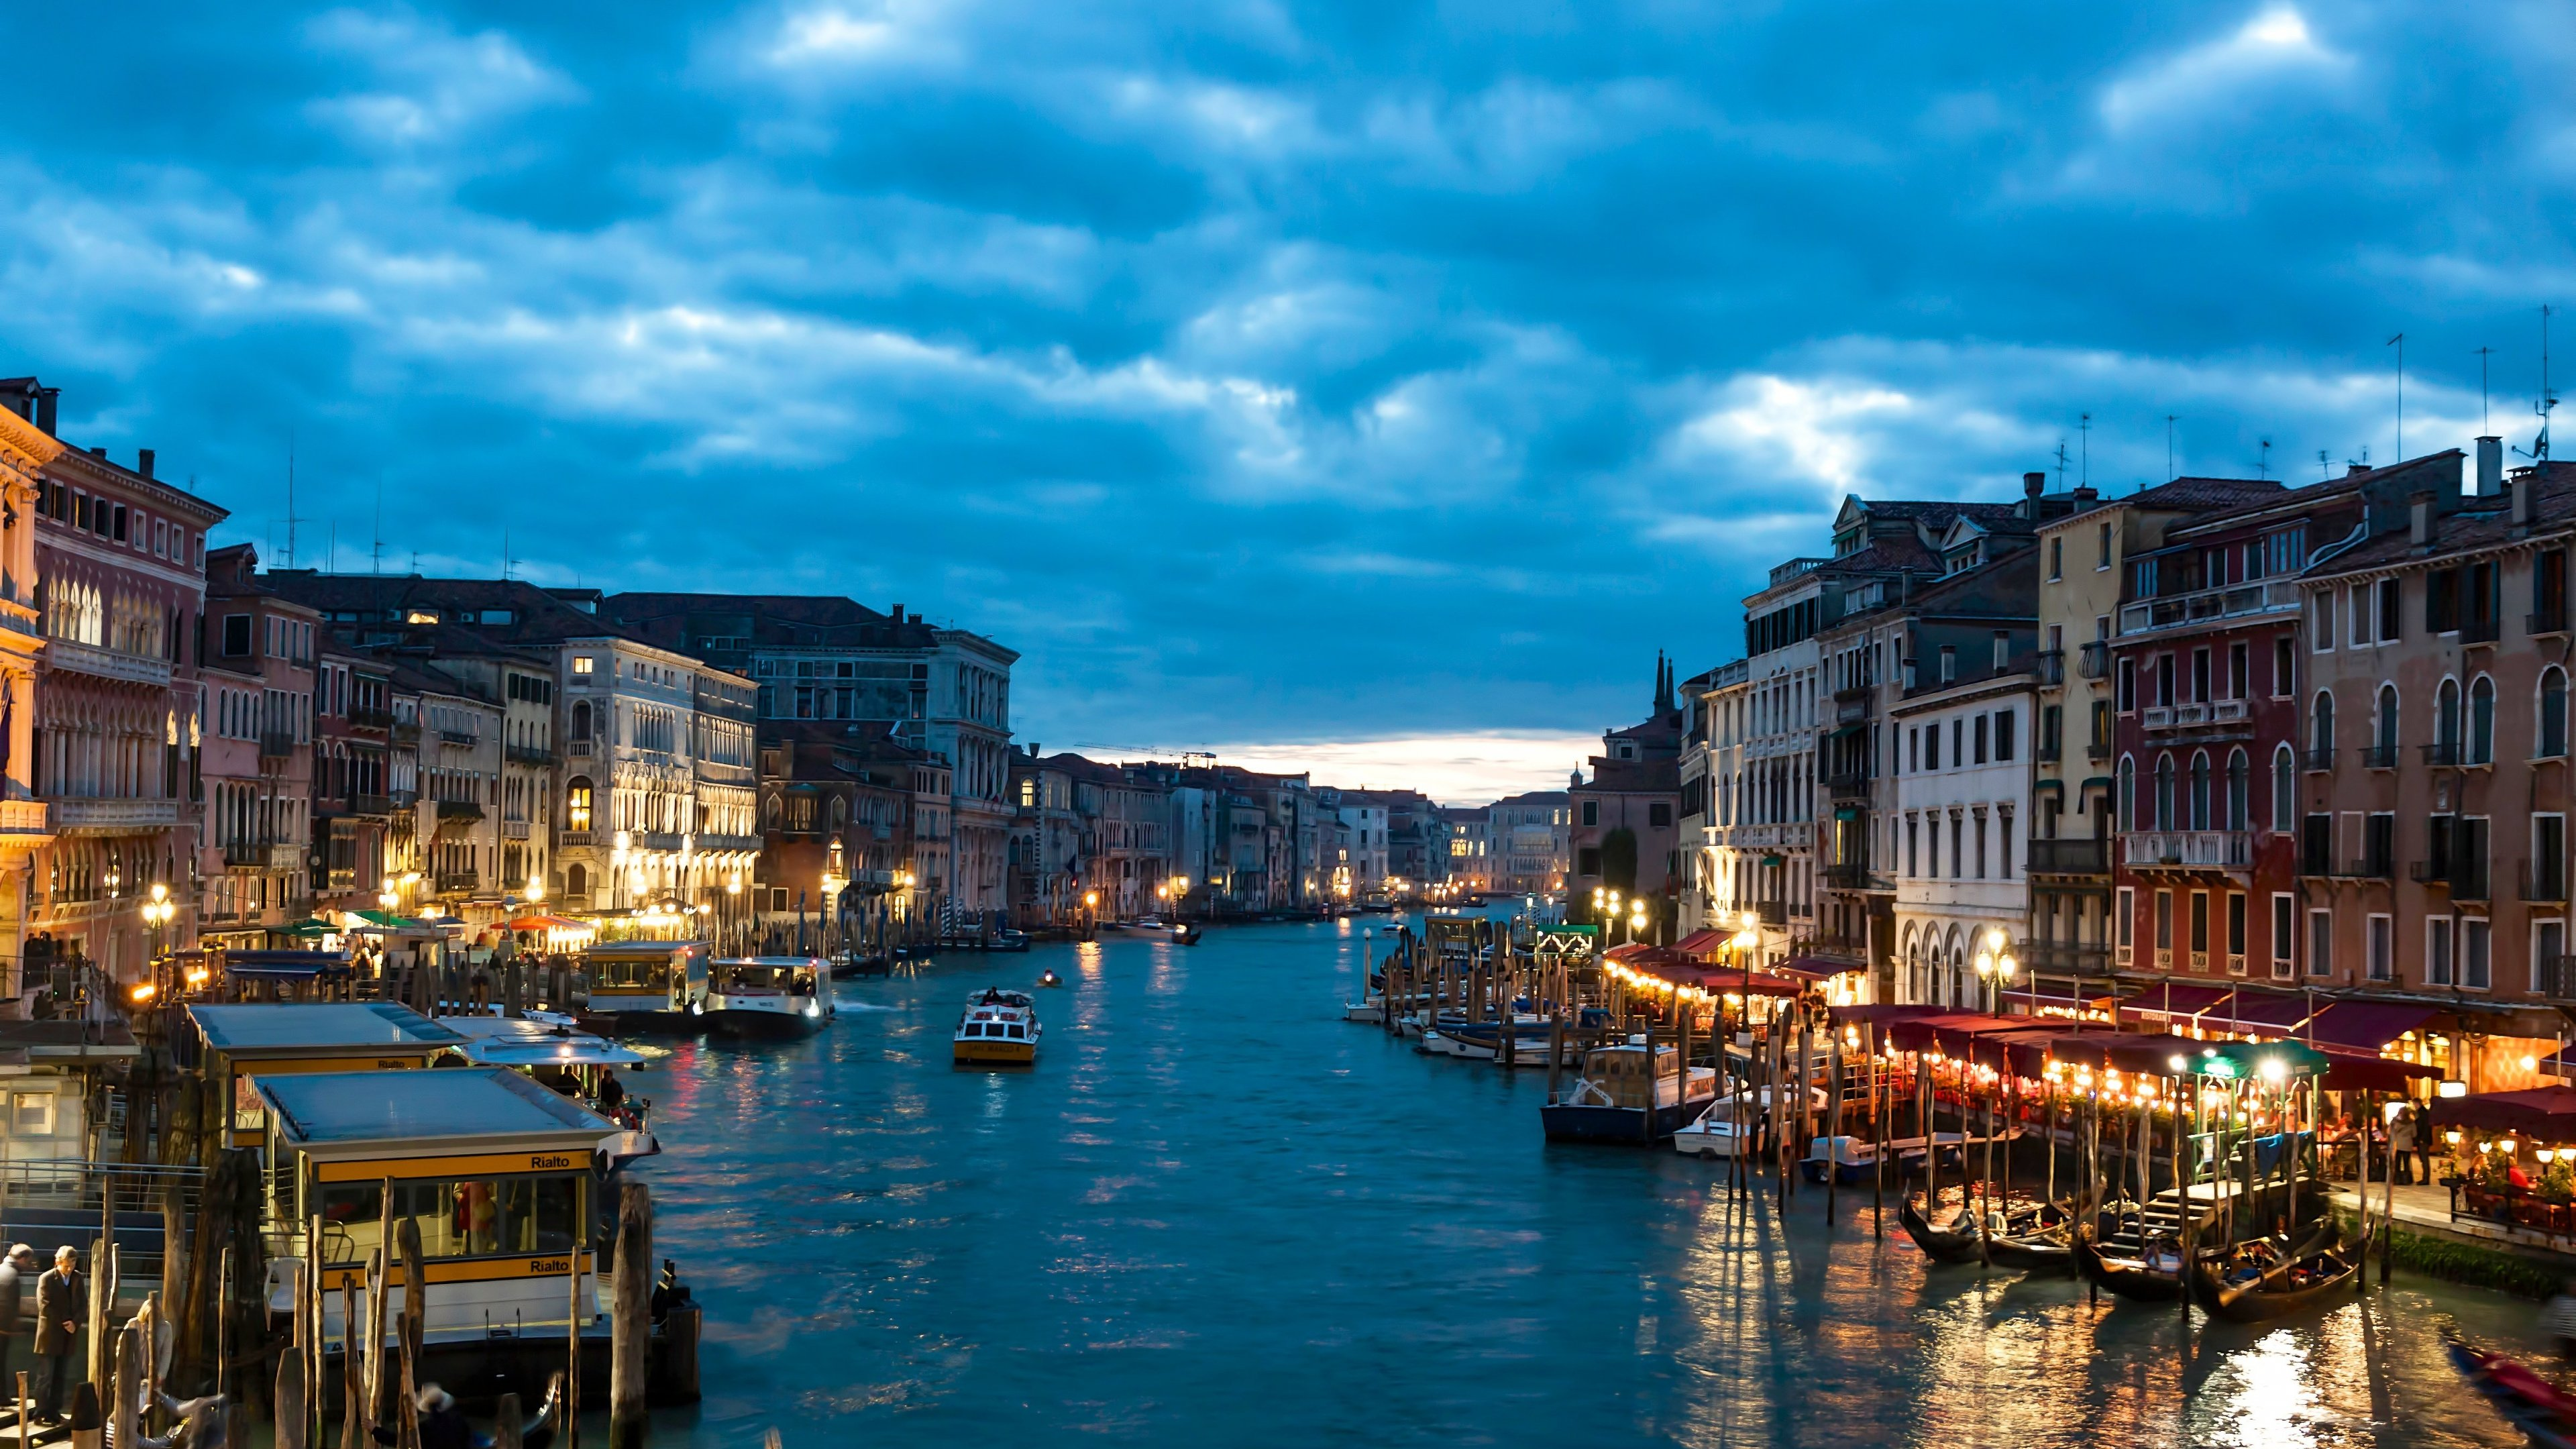 Venice 4K Ultra HD Wallpaper 3840x2160